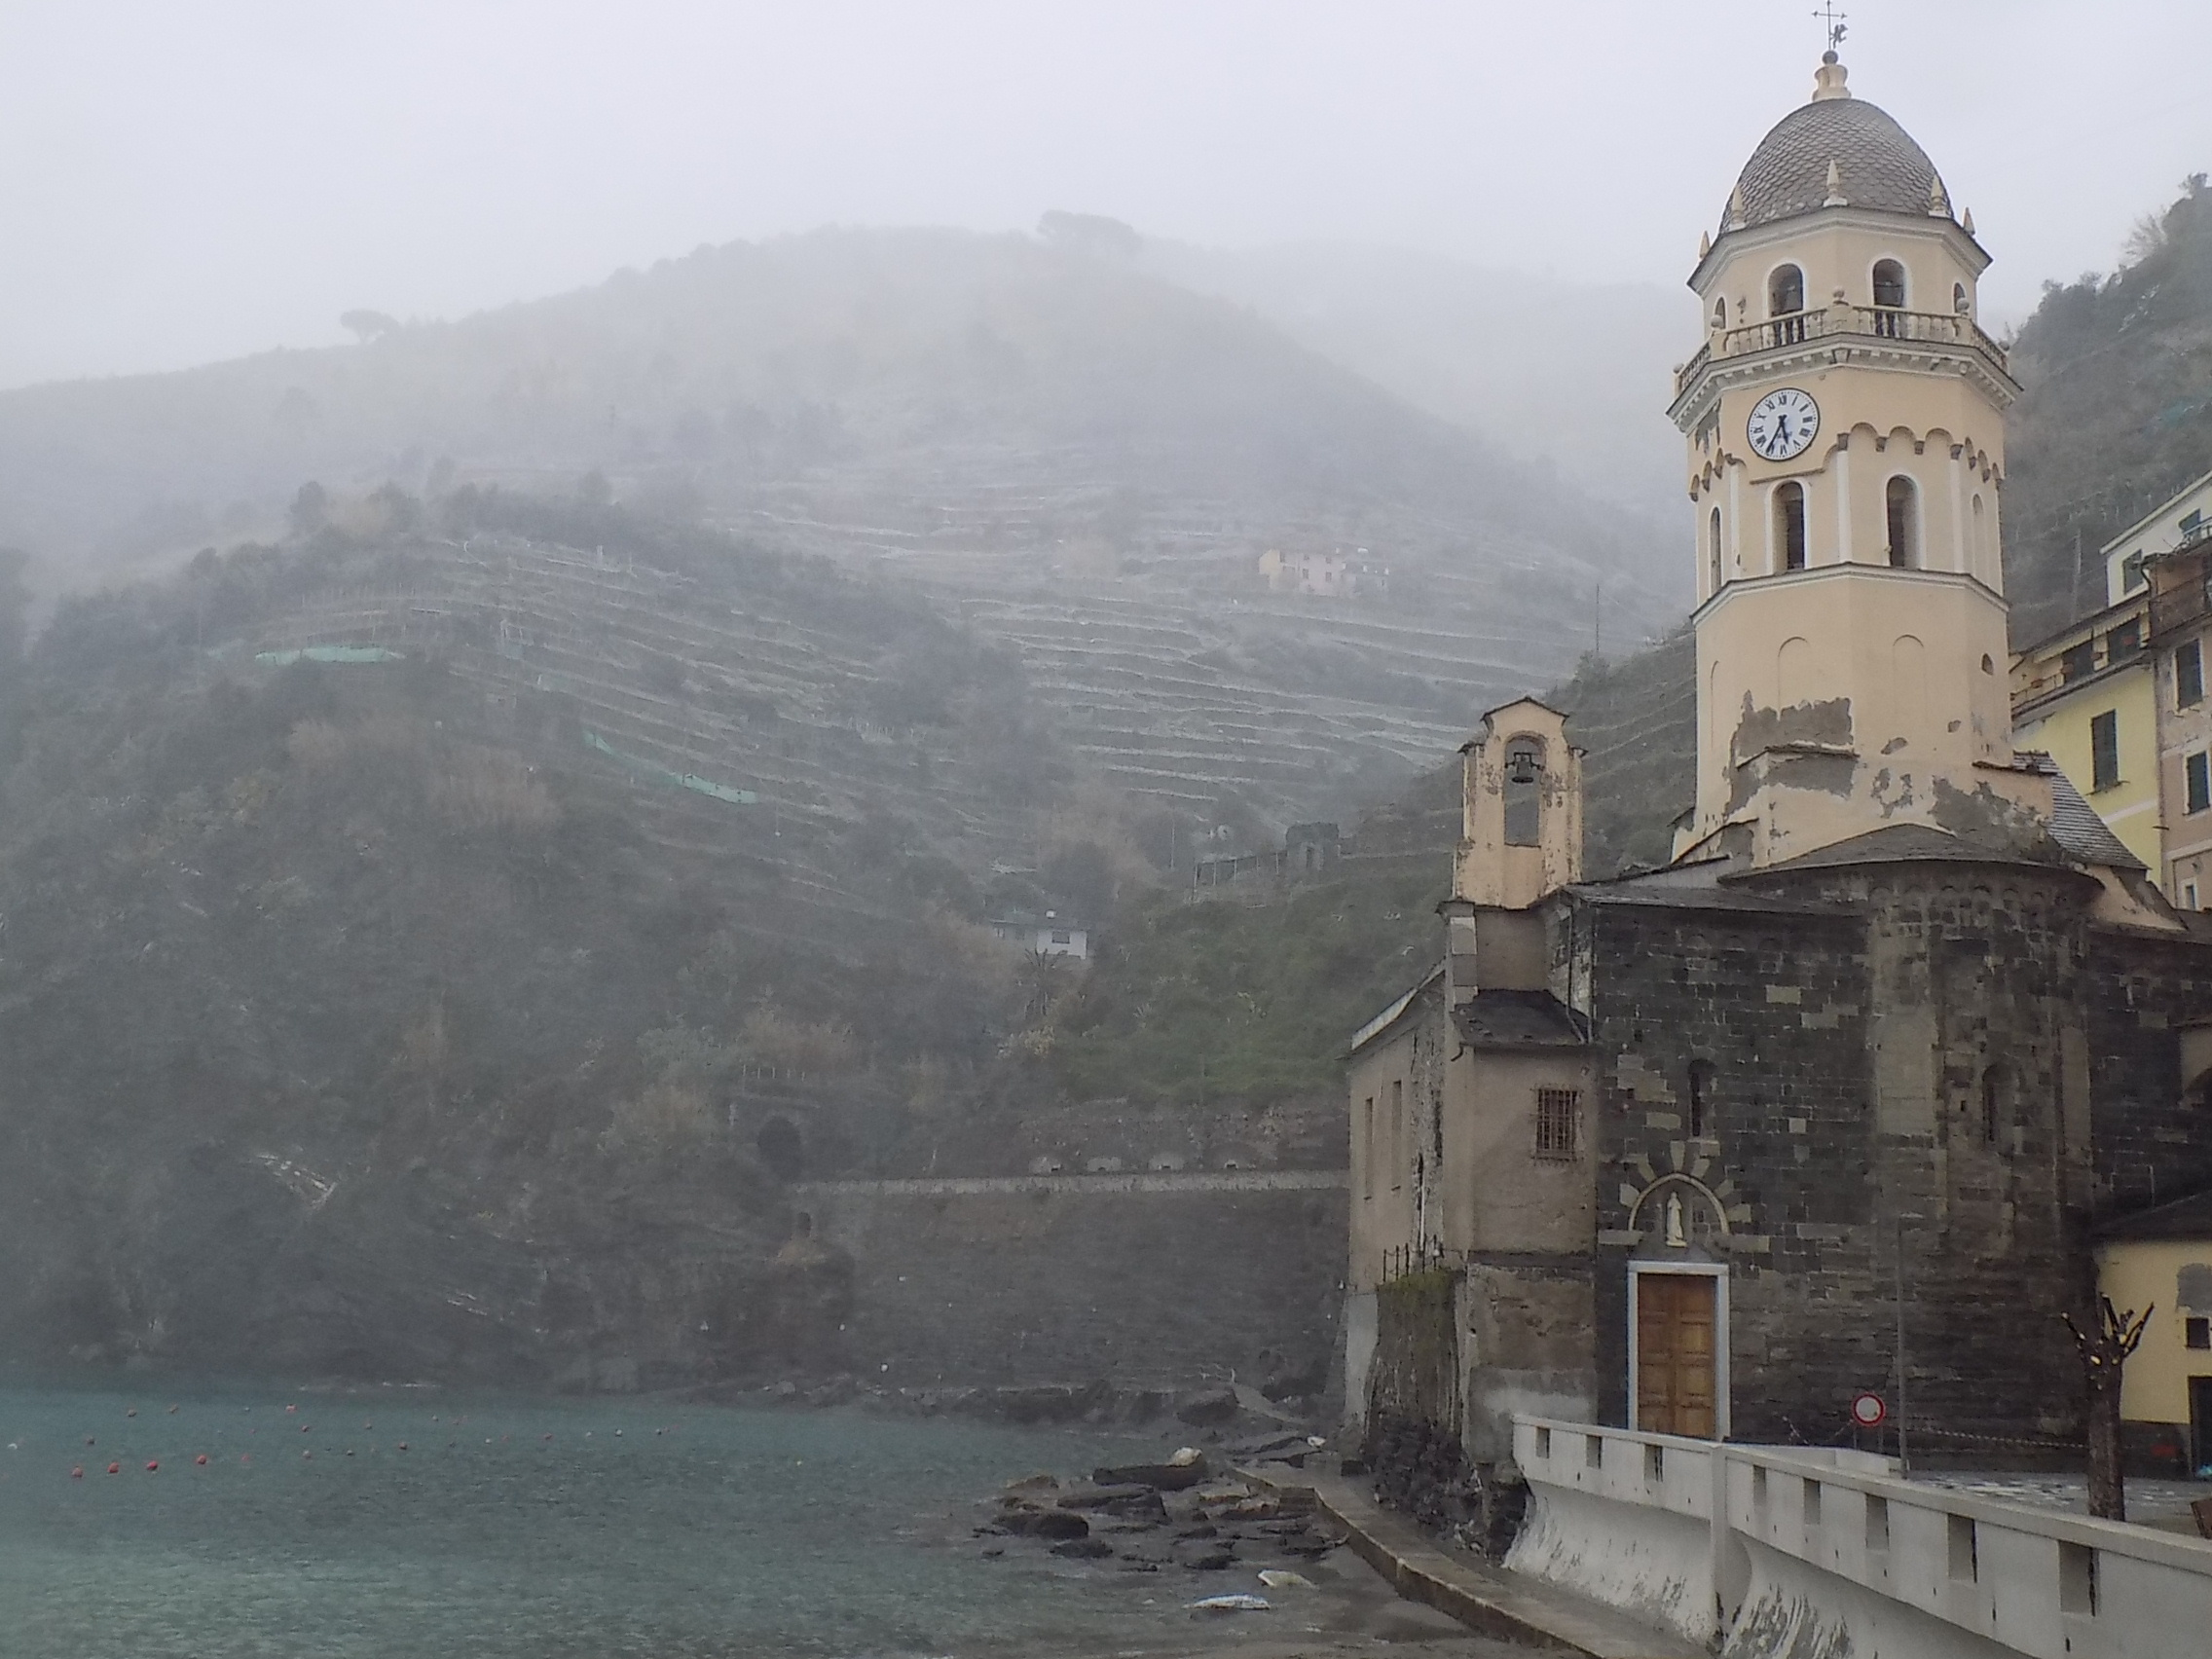 Nowcasting Liguria 2019-vernazza-25-febbraio-098.jpg